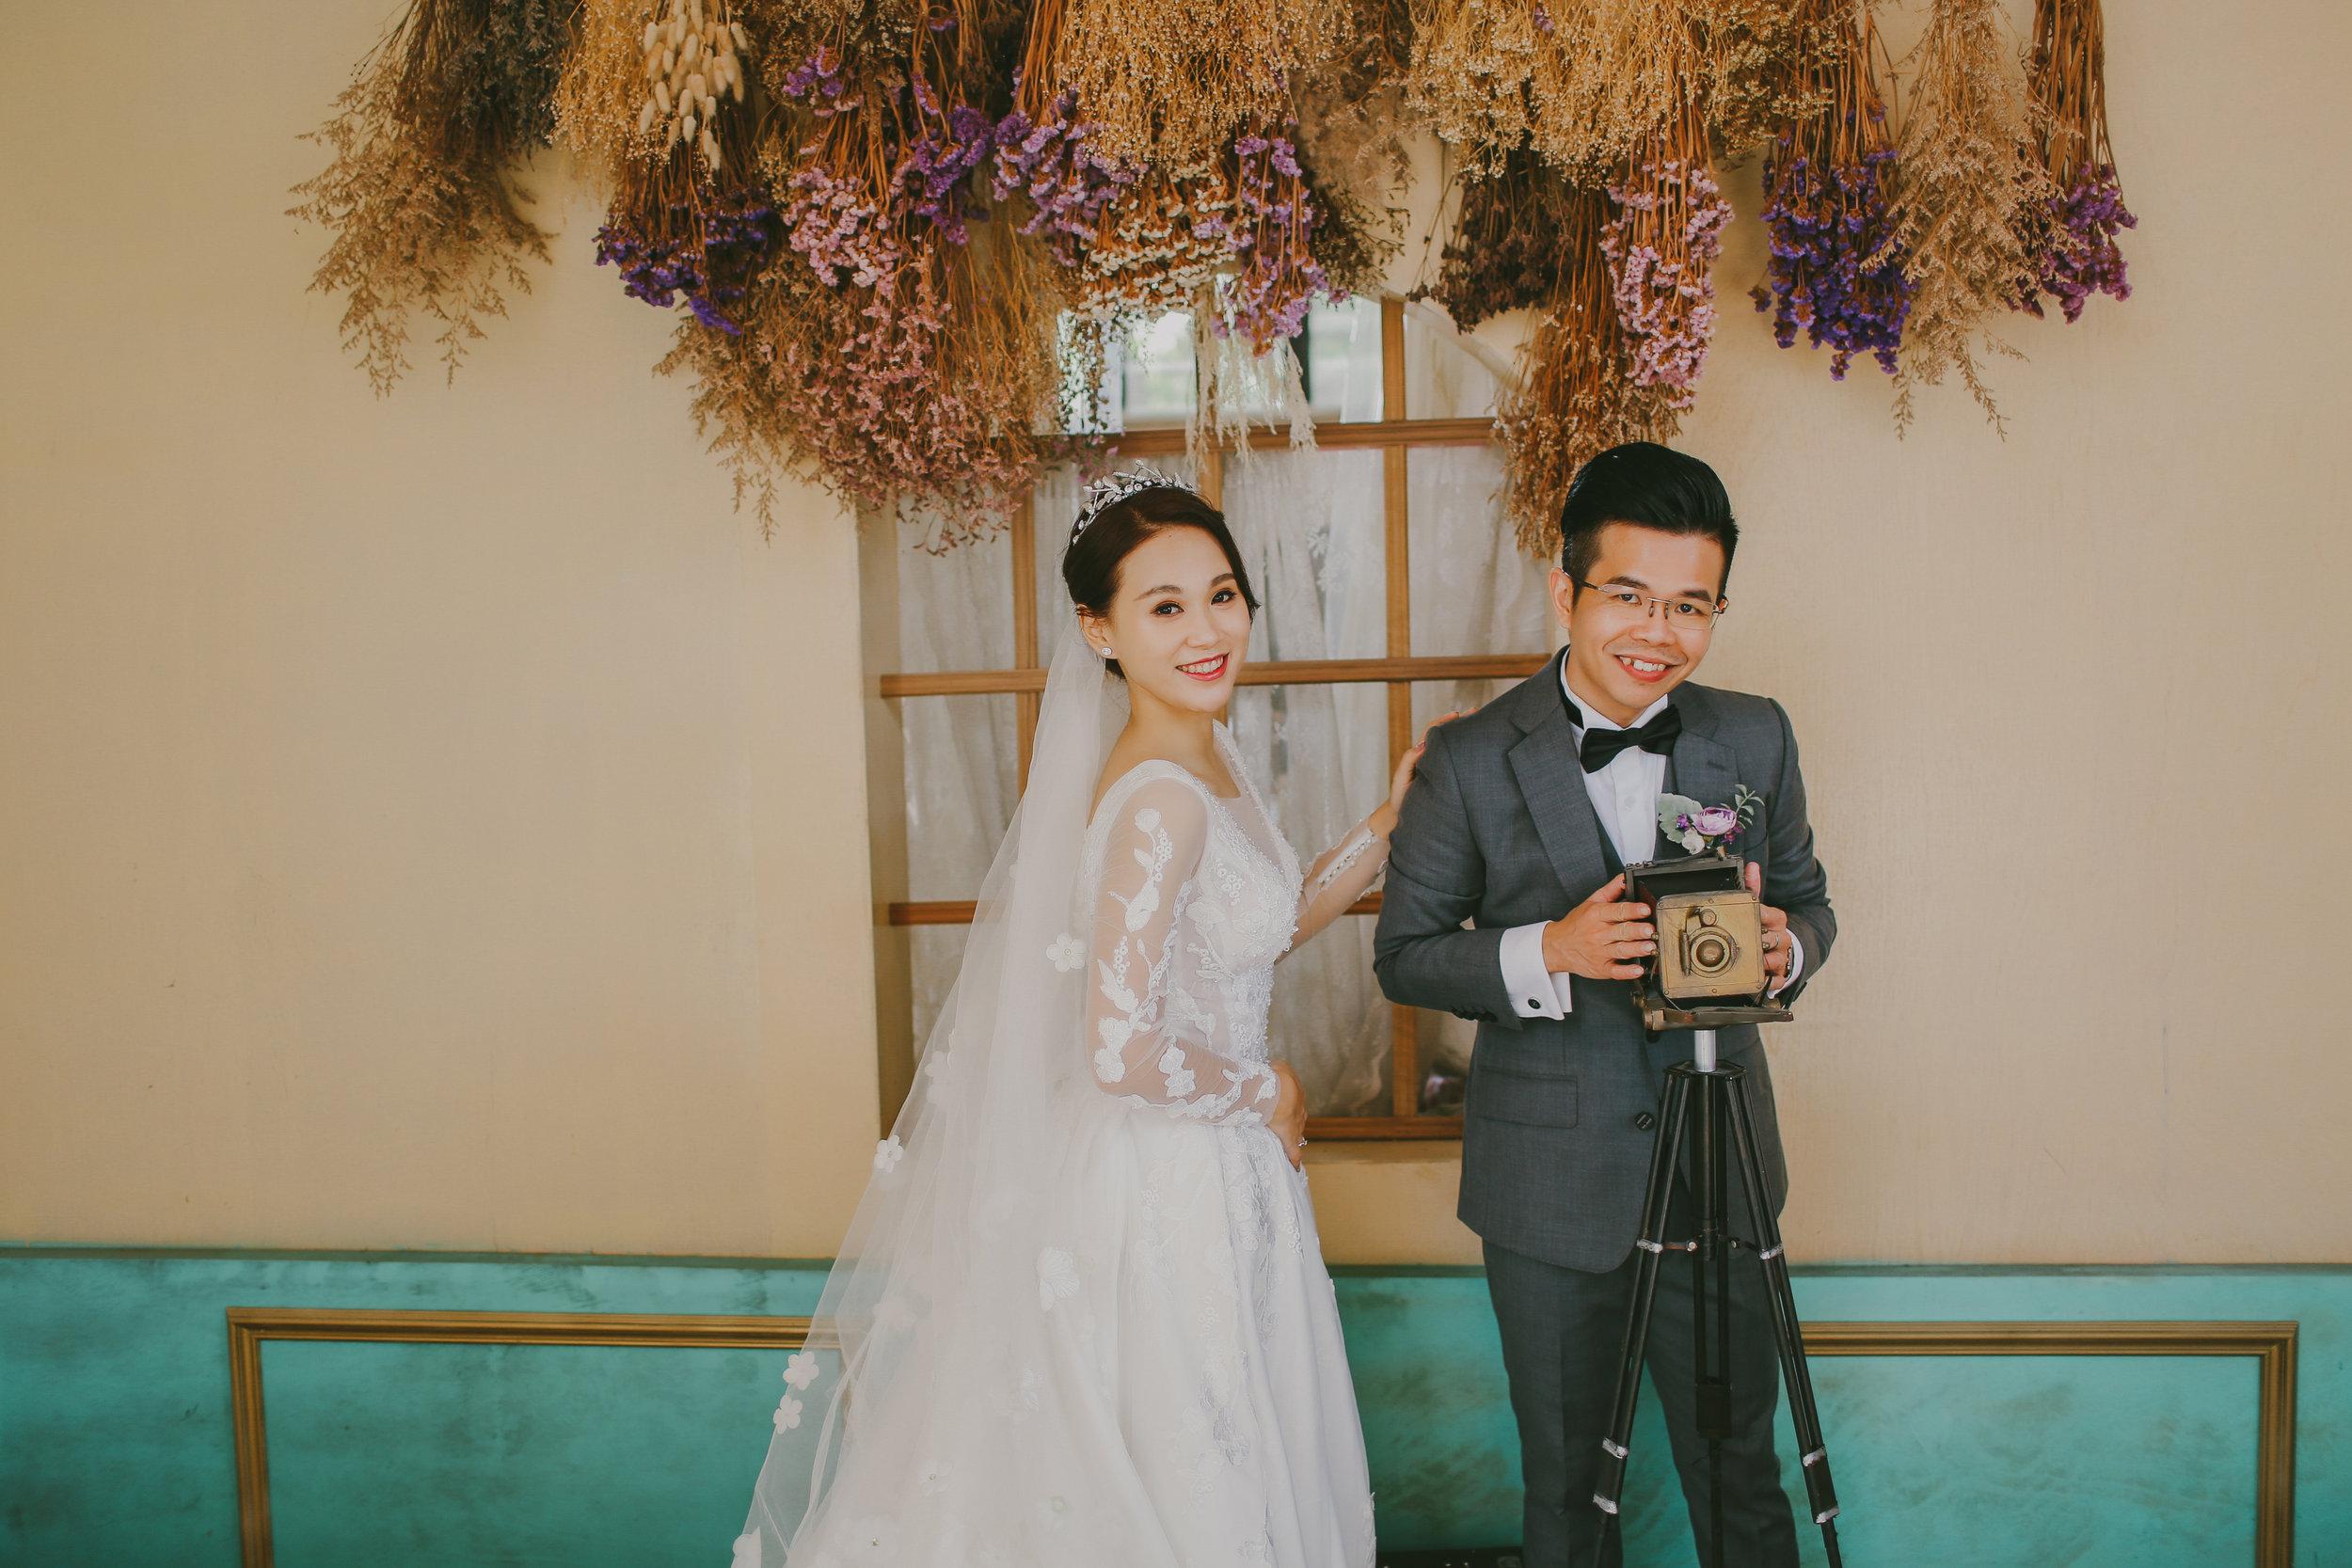 2019-pre-wedding-studio-numb9r-janda-baik-bentong-malaysia-7879e.jpg